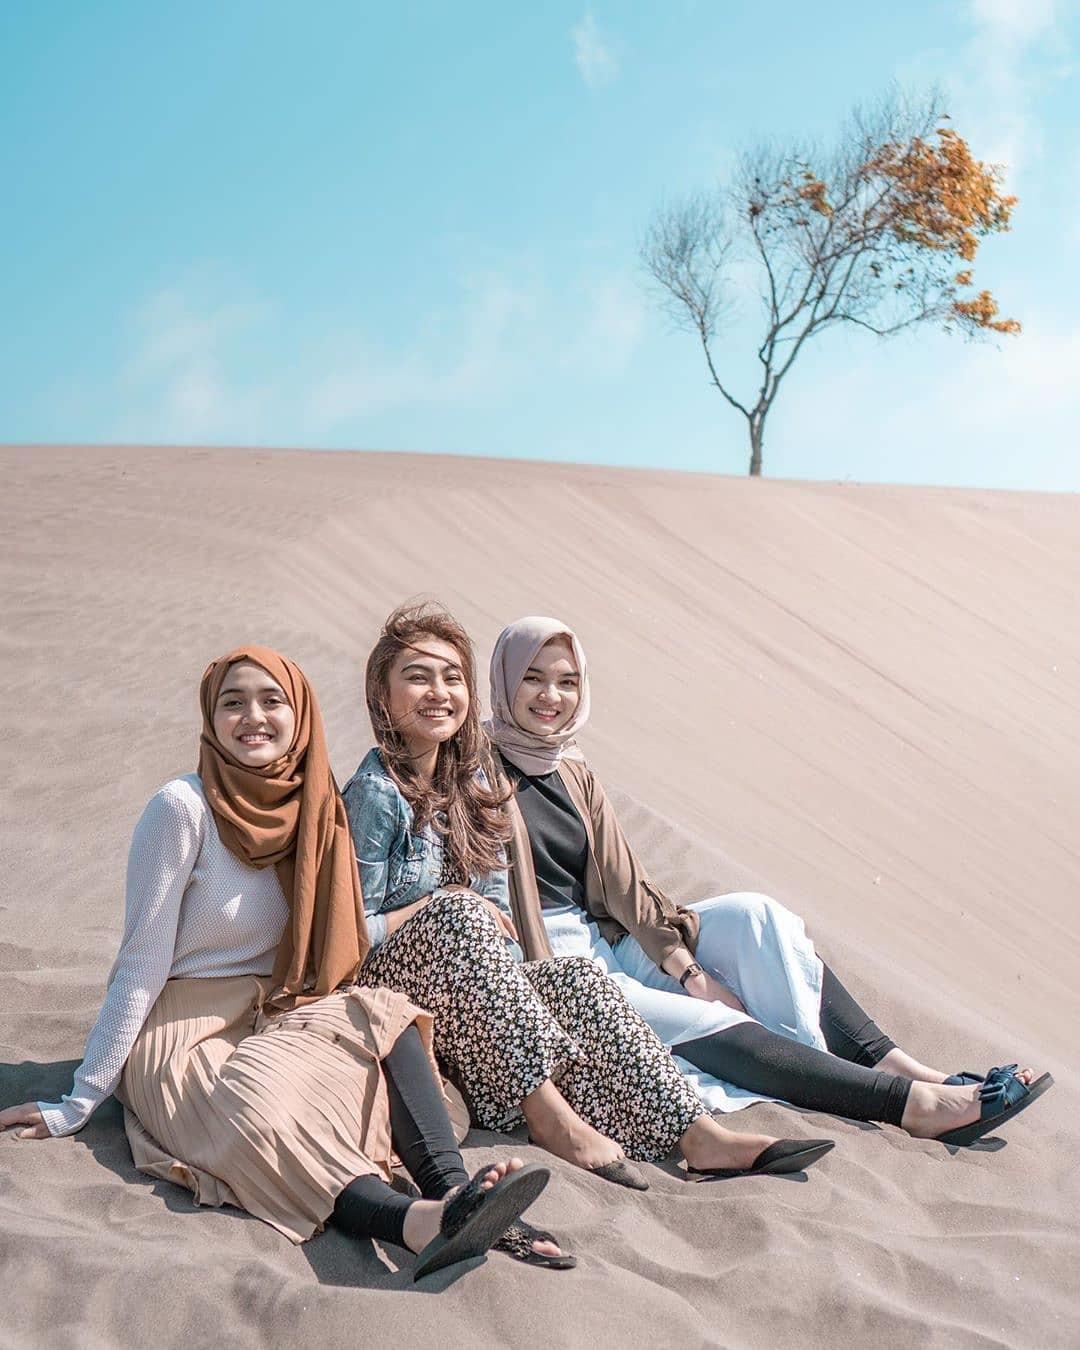 Harga Tiket Masuk Dan Lokasi Gumuk Pasir Parangkusumo Jogja Terbaru Wisata Oke